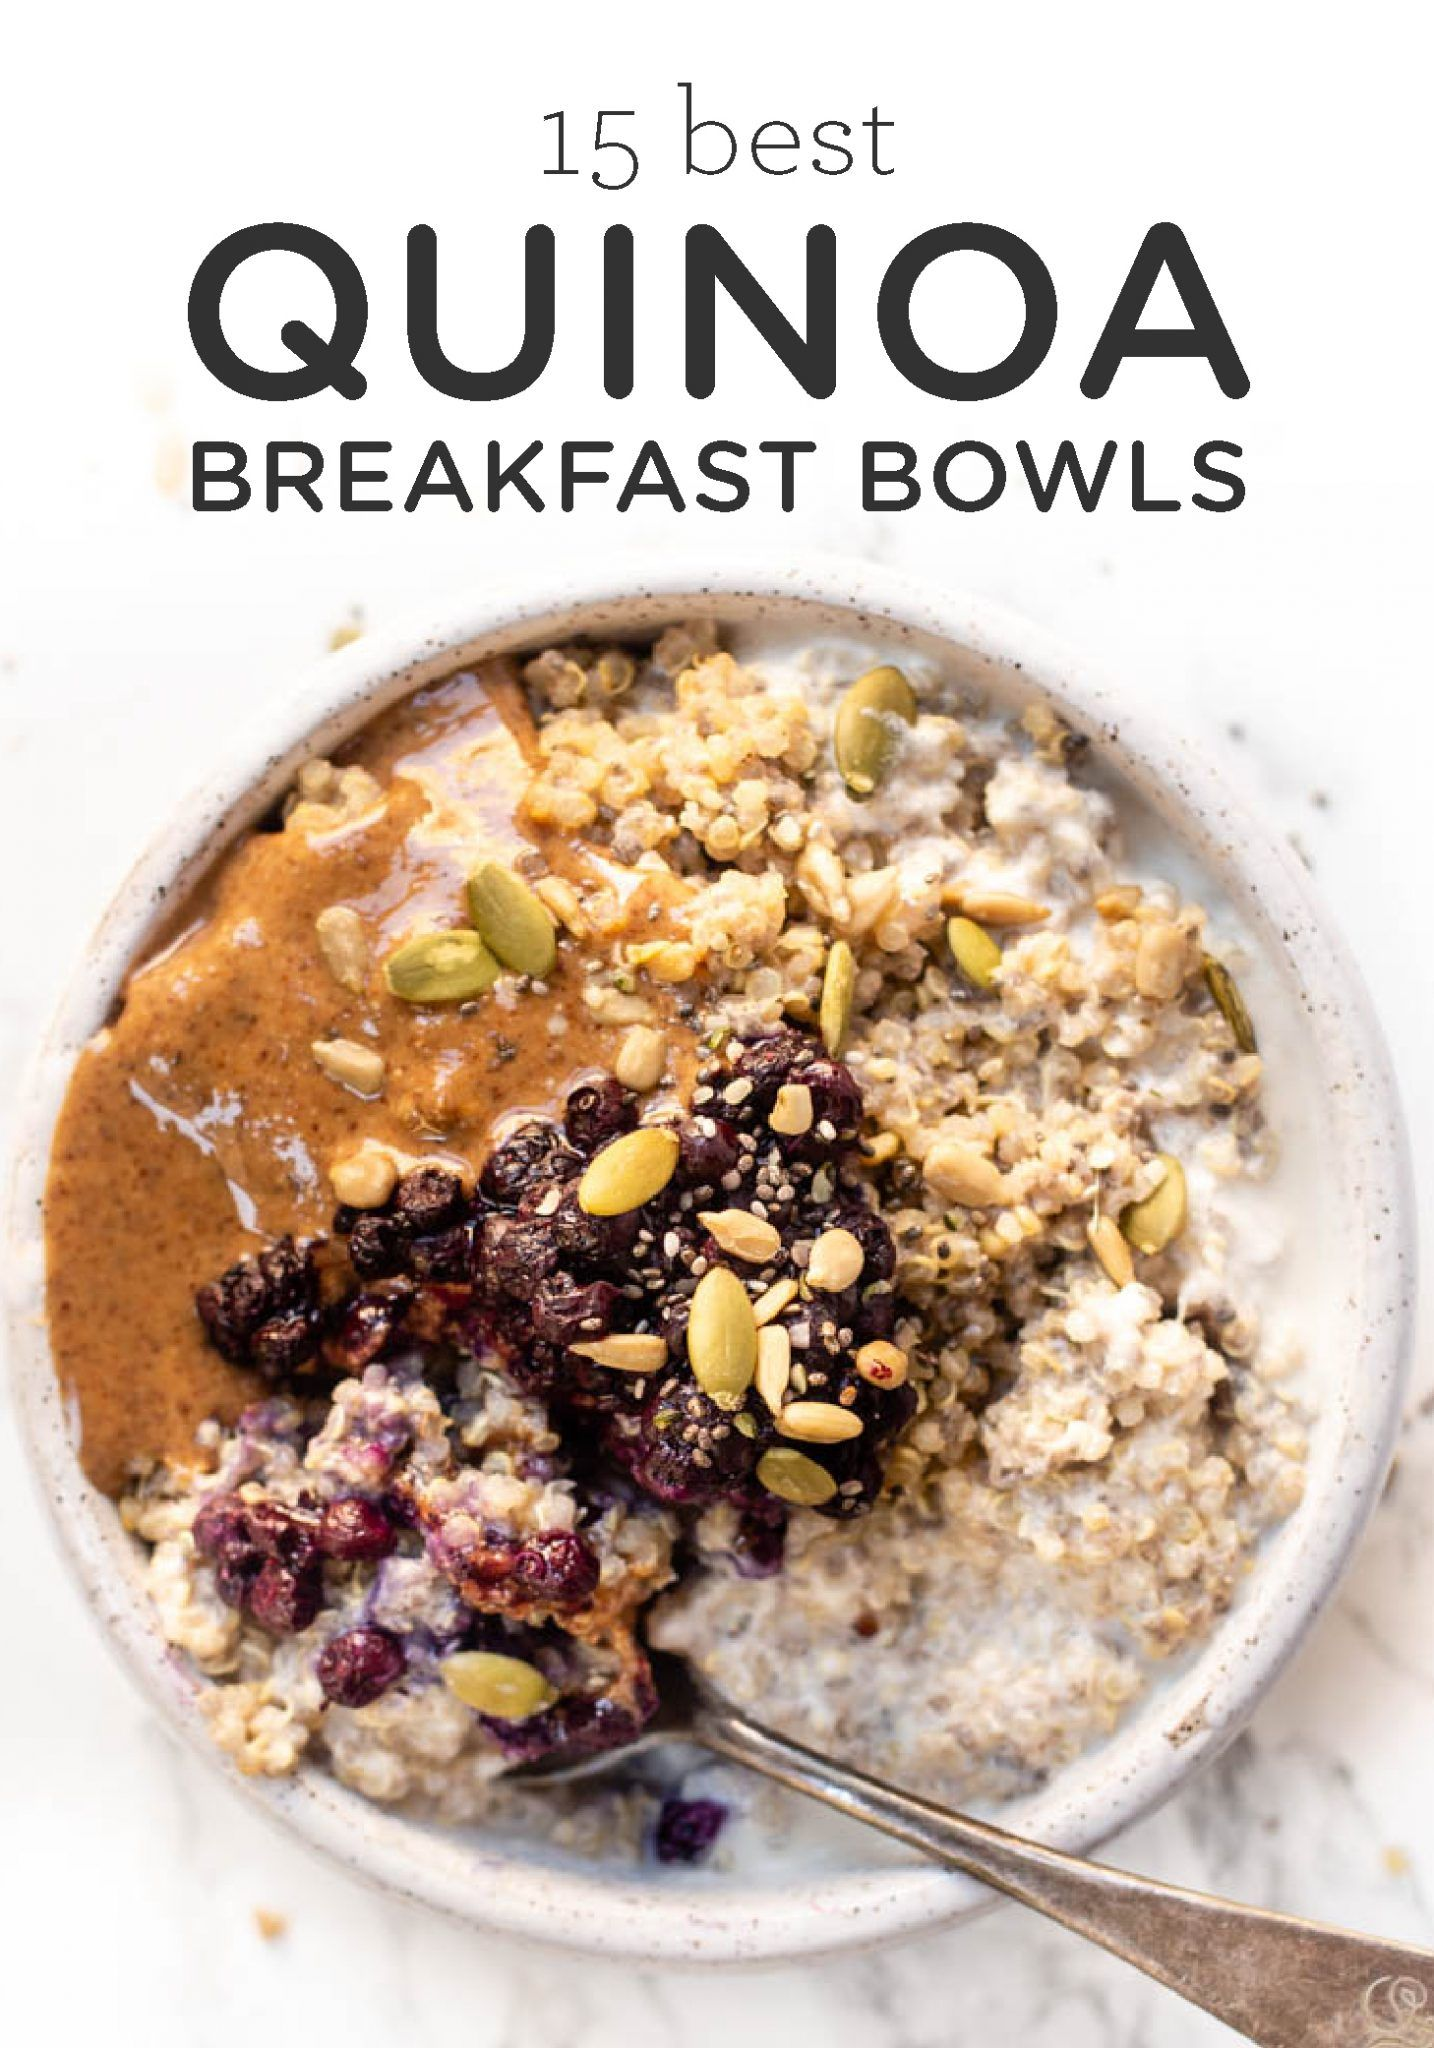 15 Best Quinoa Breakfast Bowls Simply Quinoa Breakfast Bowls Recipe Breakfast Bowls Quinoa Recipes Breakfast